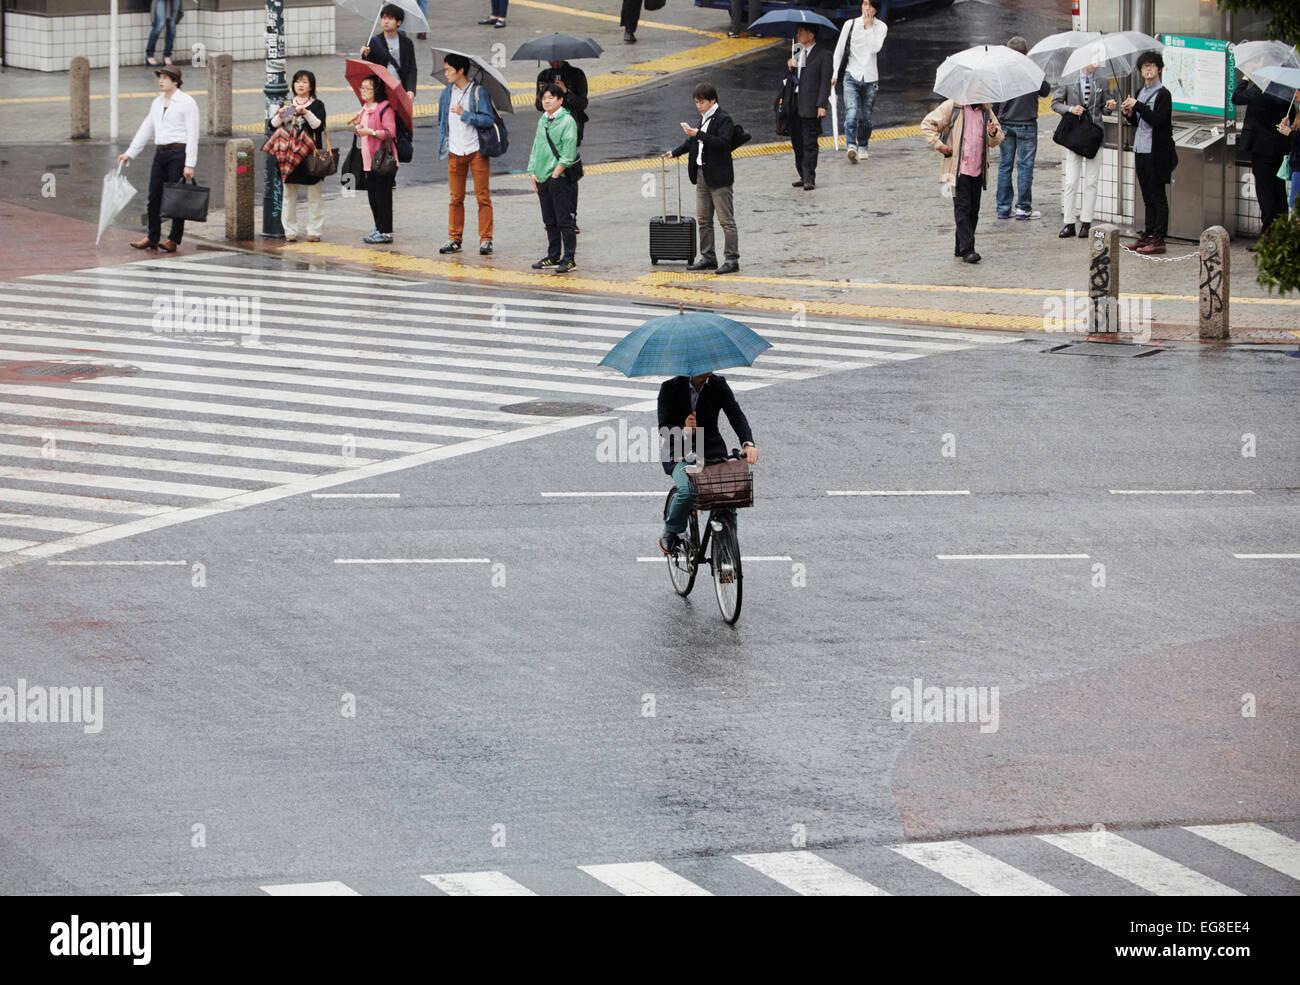 Cyclist with umbrellas on Shibuya scramble crossing, Shibuya, Tokyo, Japan - Stock Image